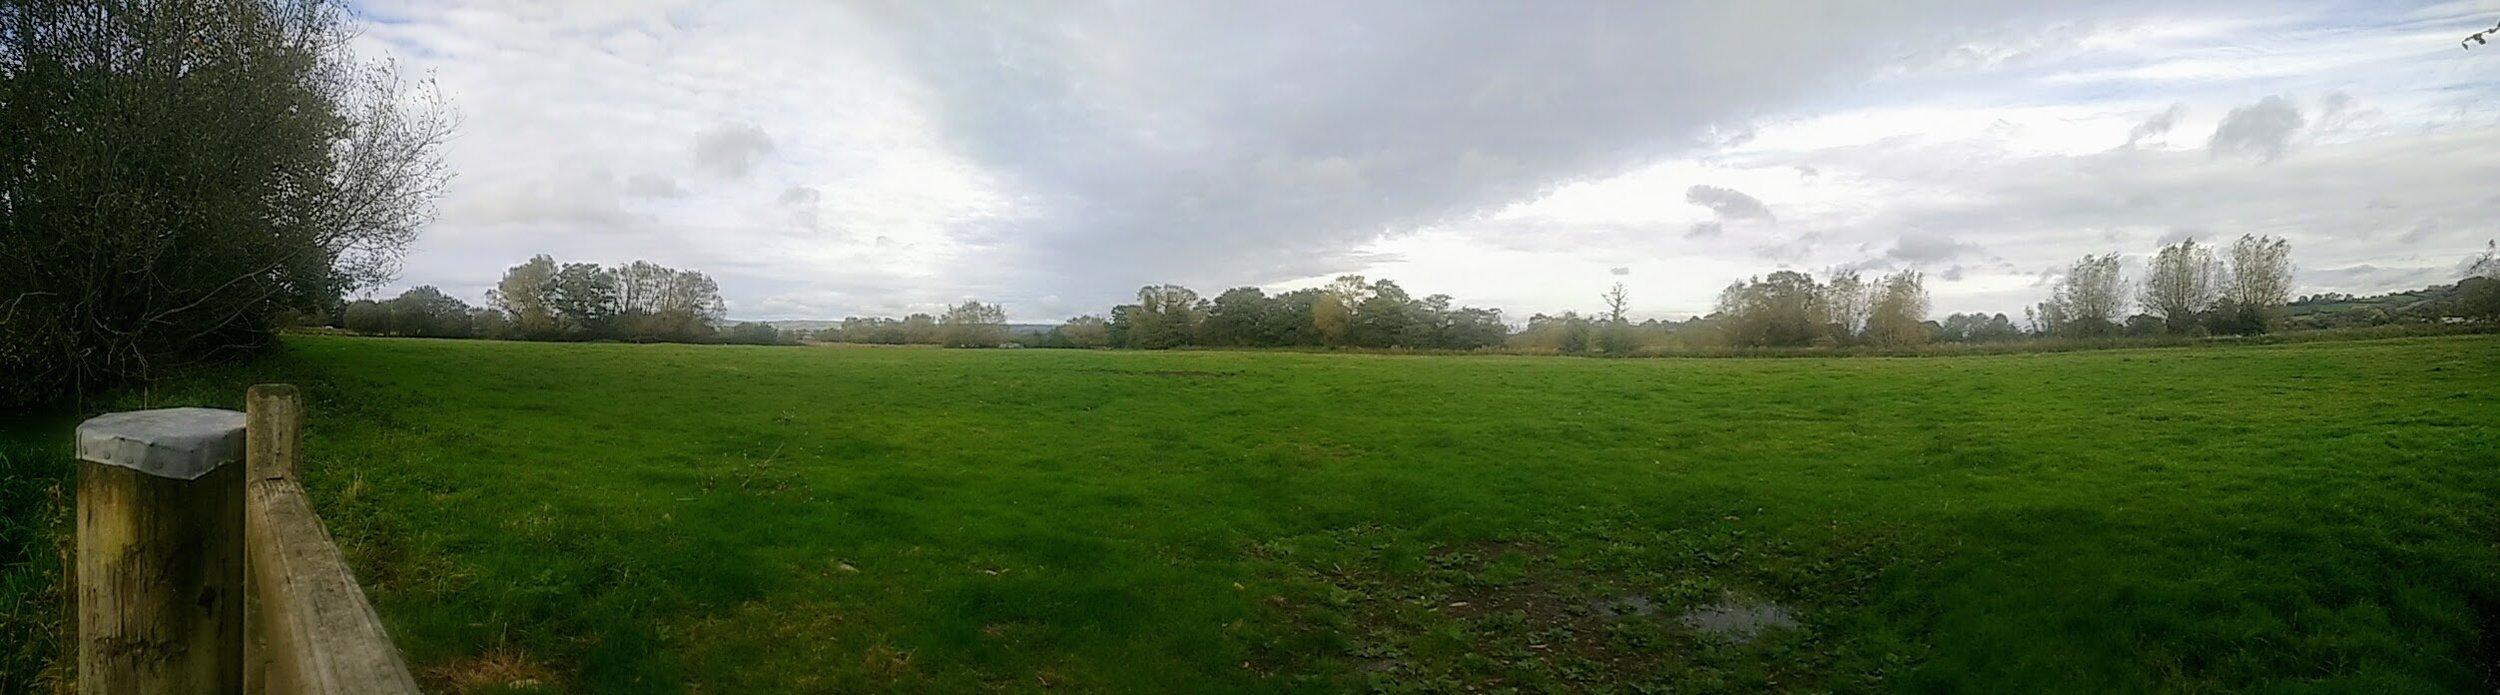 Site of Glastonbury Lake Village